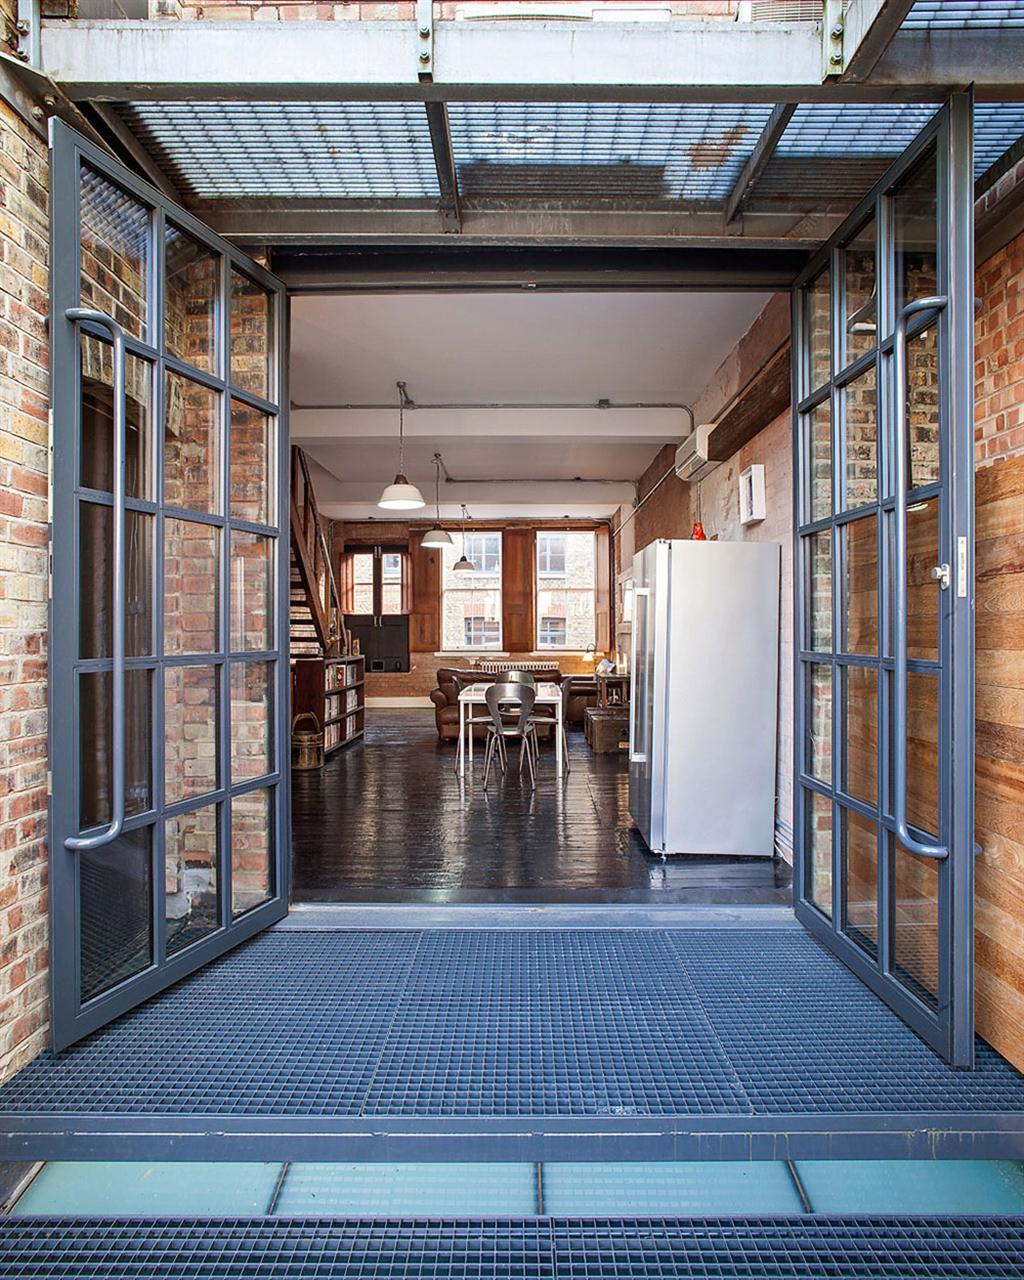 Shoreditch Warehouse Conversion by Chris Dyson 2